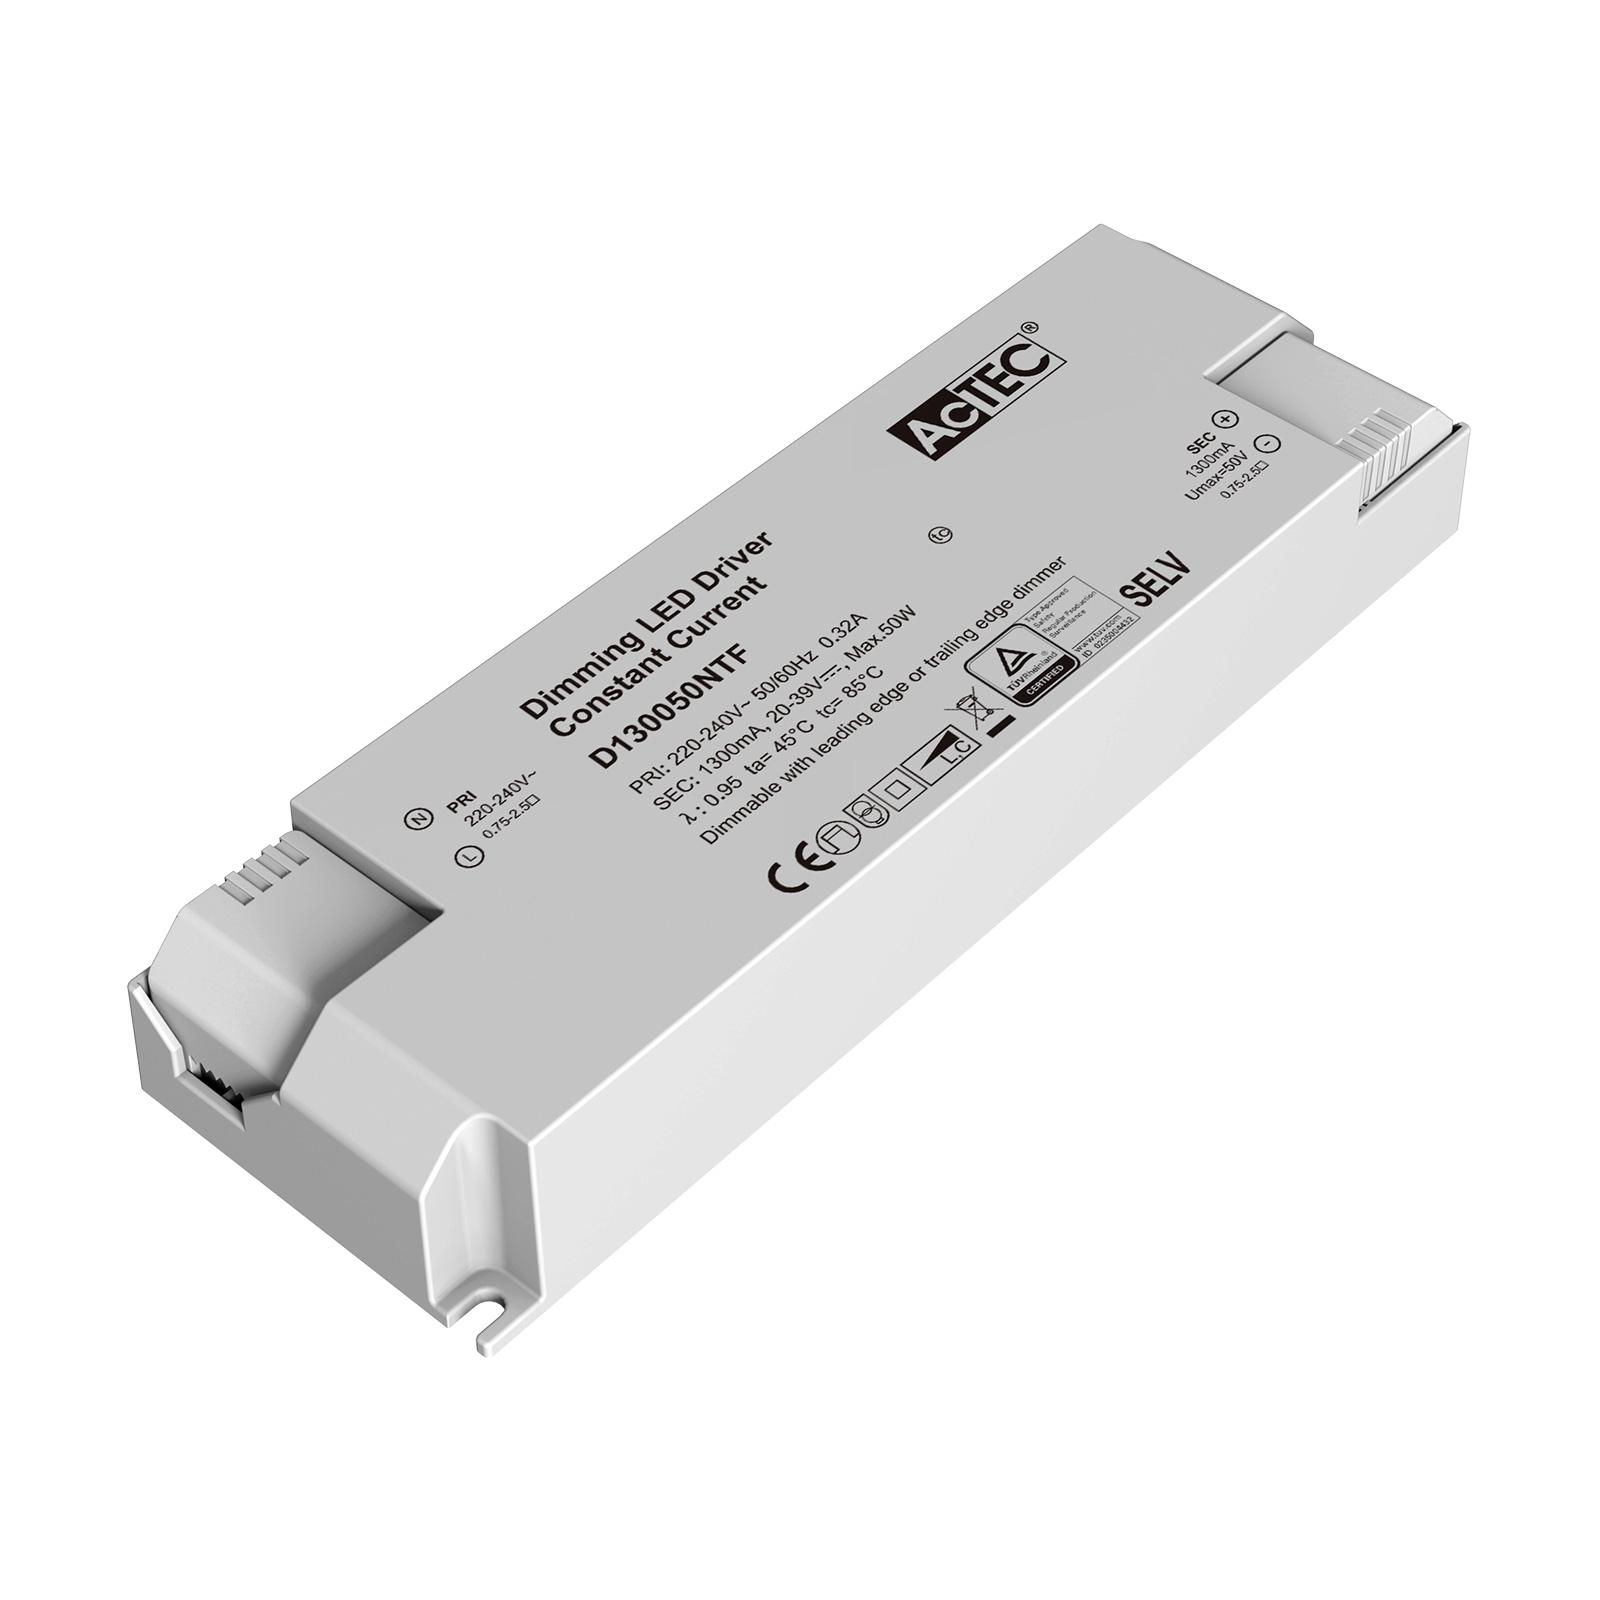 AcTEC Triac LED-driver CC maks. 50 W 1300 mA